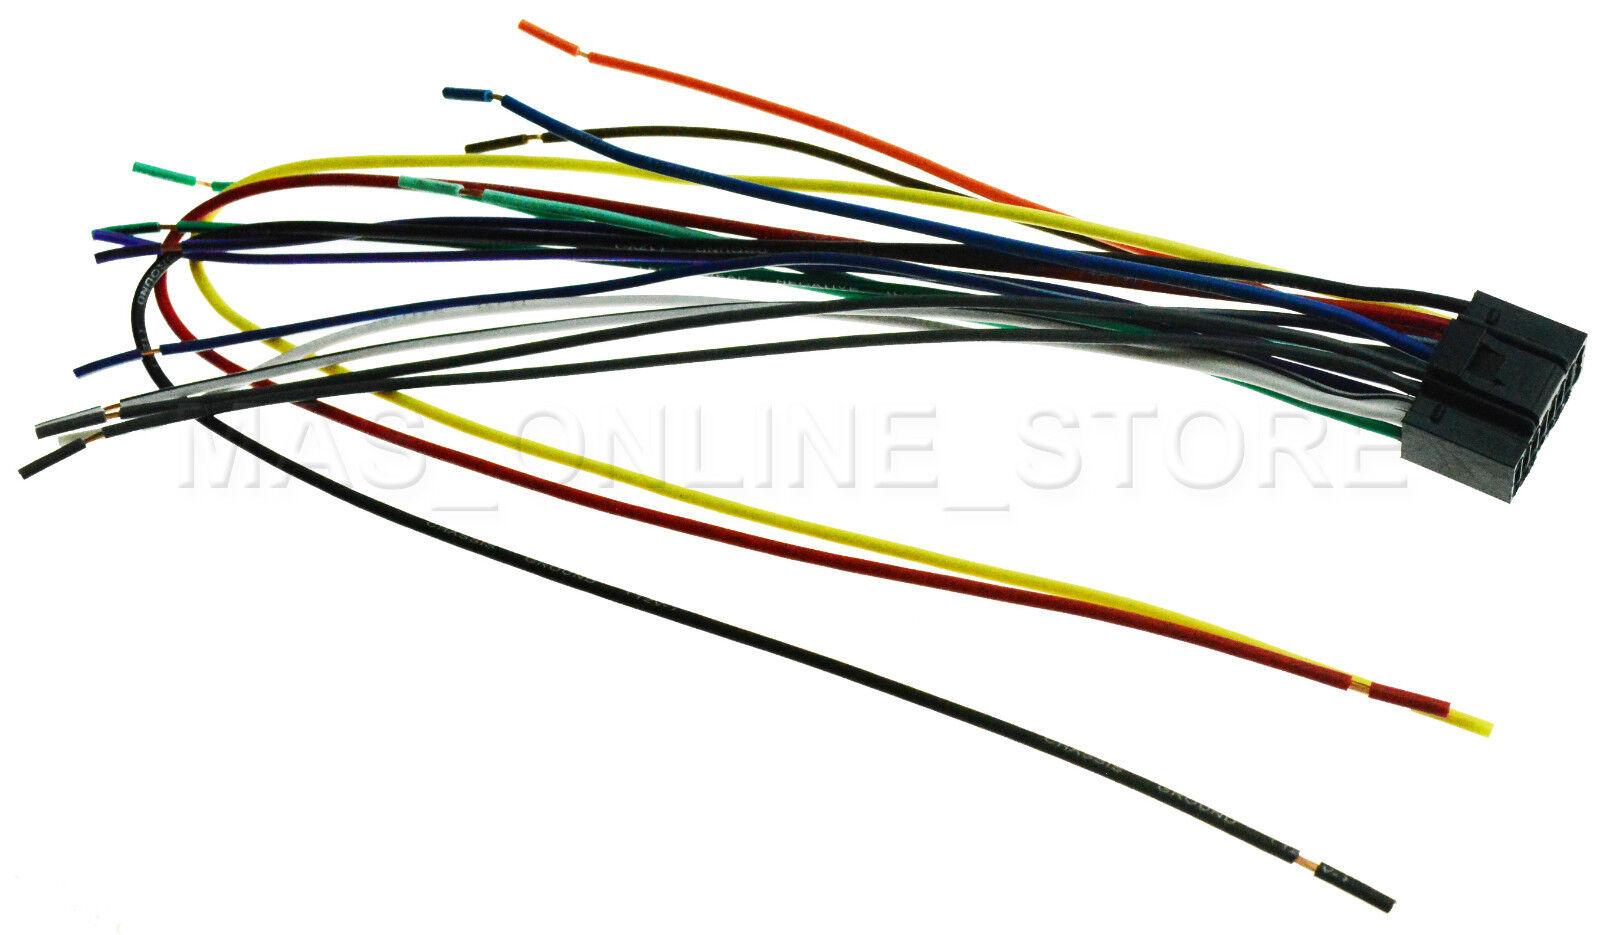 Kenwood Kdc X895 Wiring Diagram from i.ebayimg.com